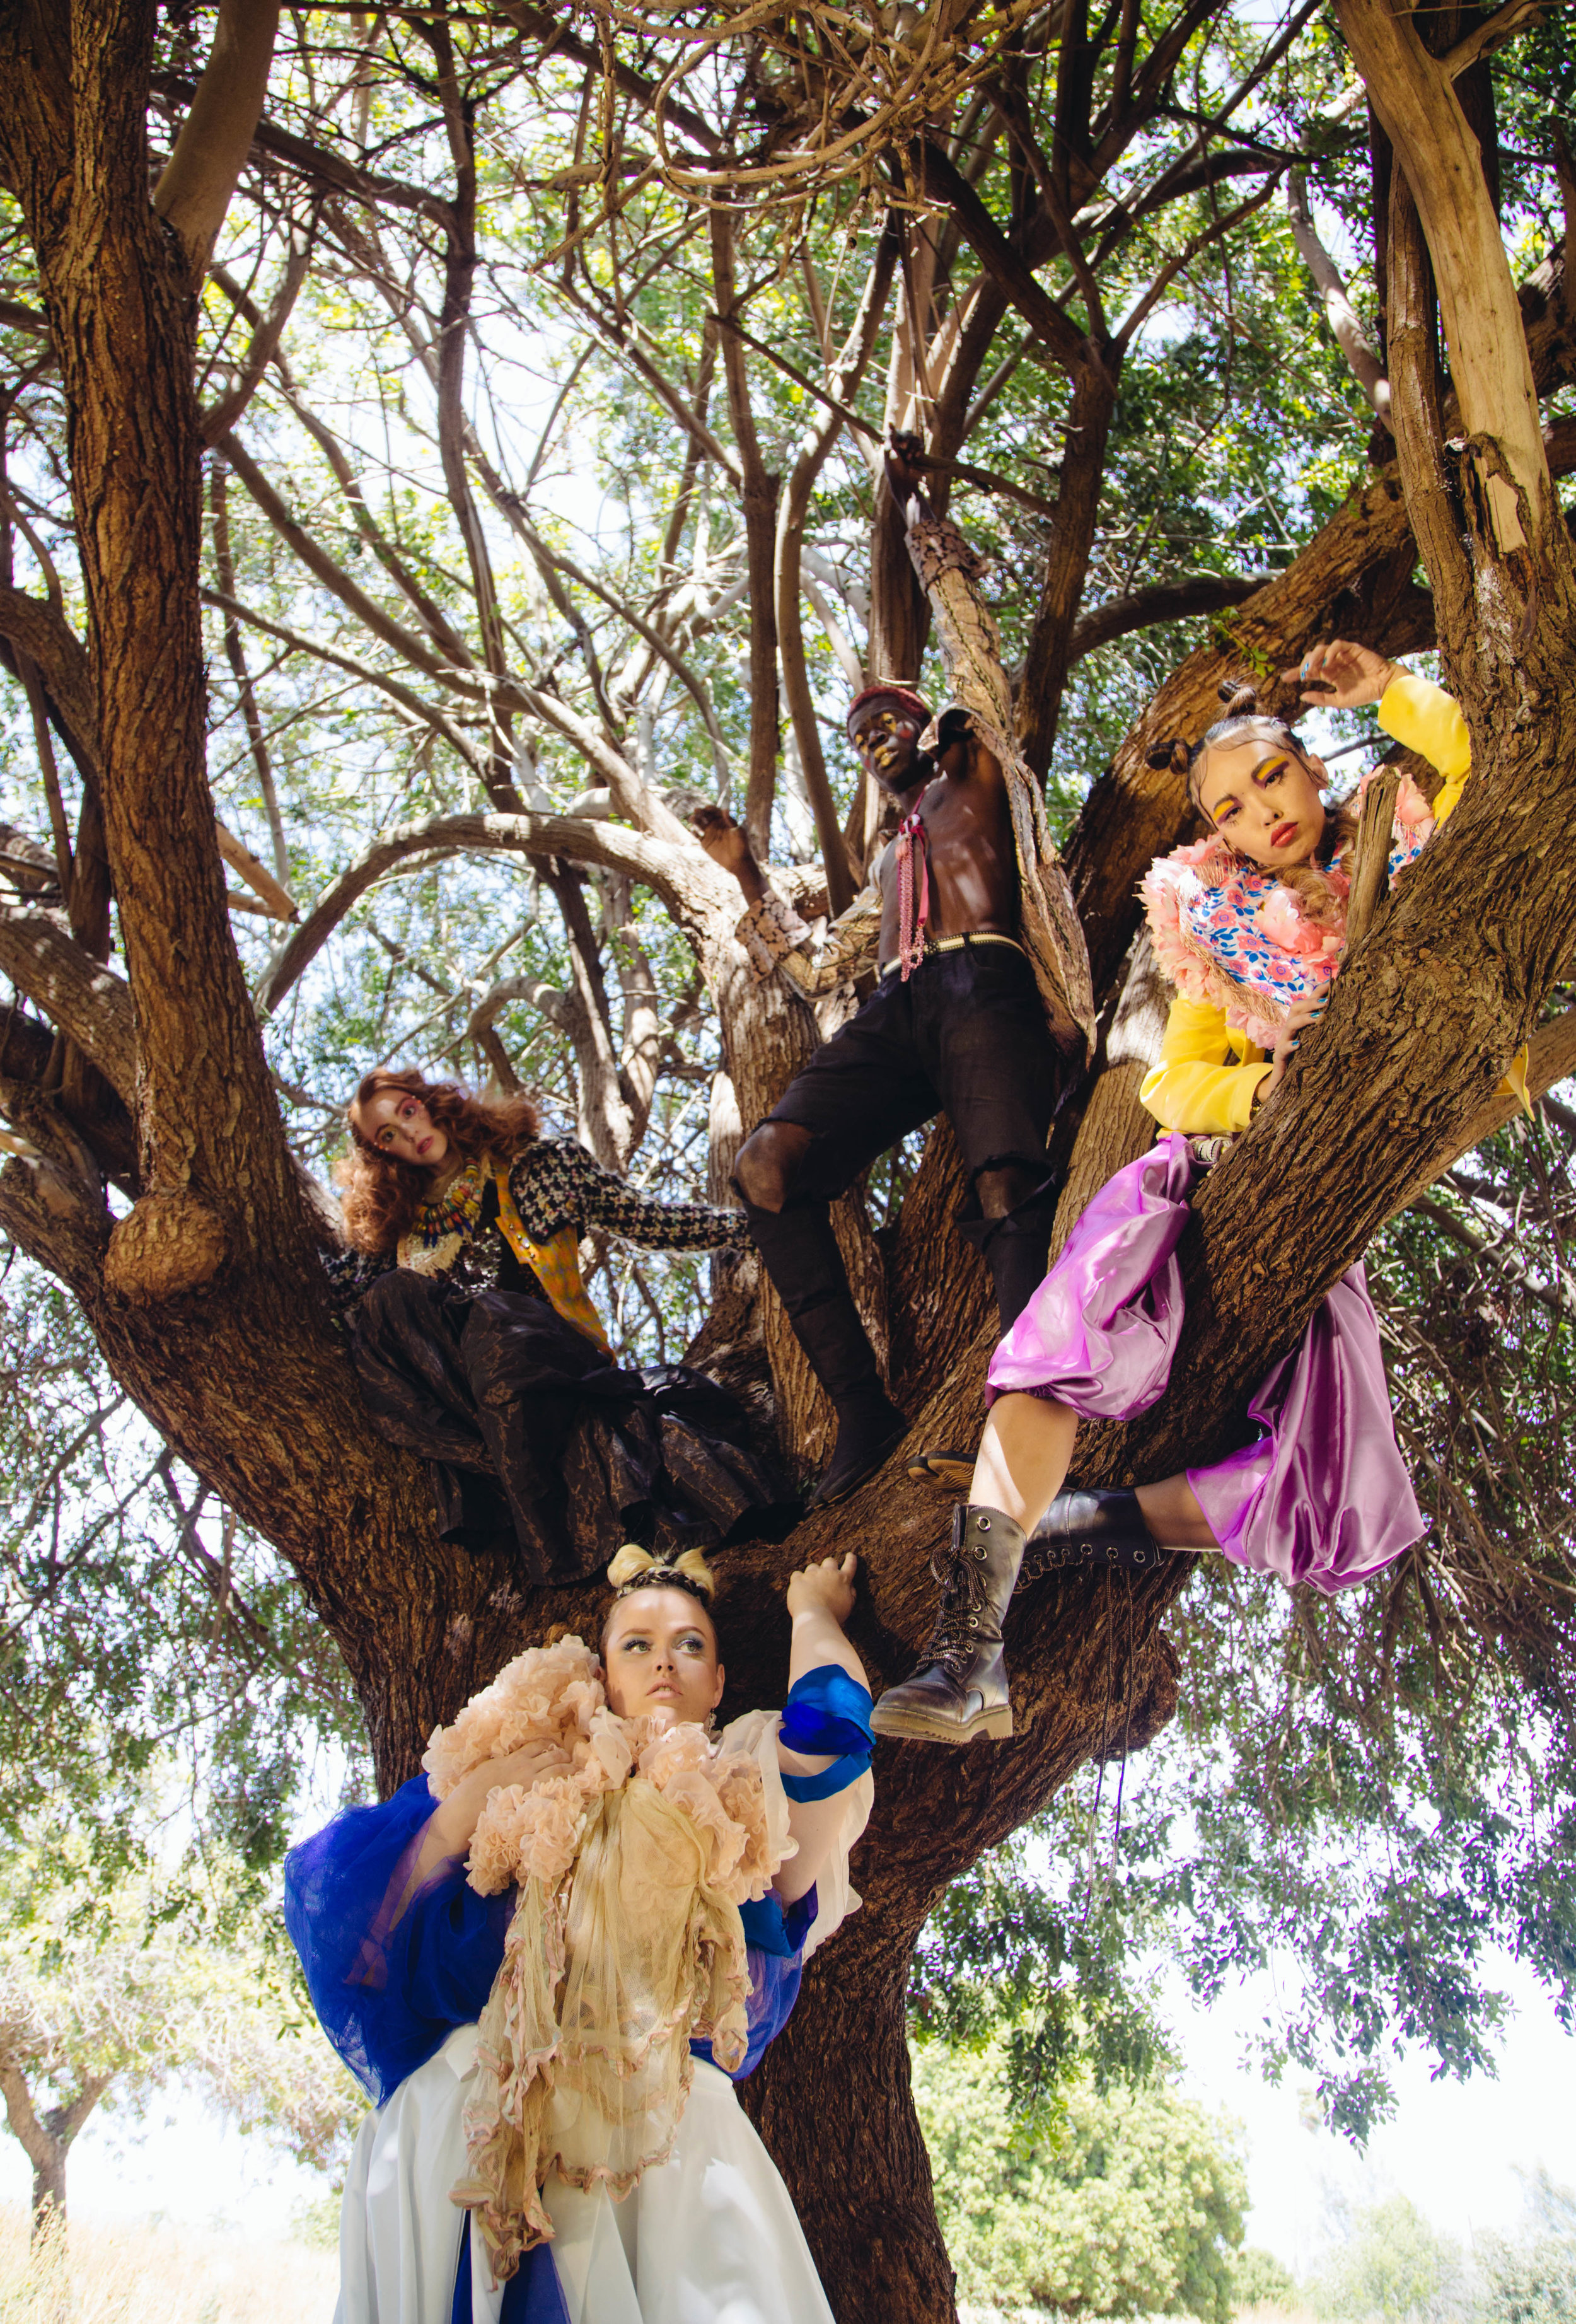 Alice & Wonderland_17-585-20.jpg